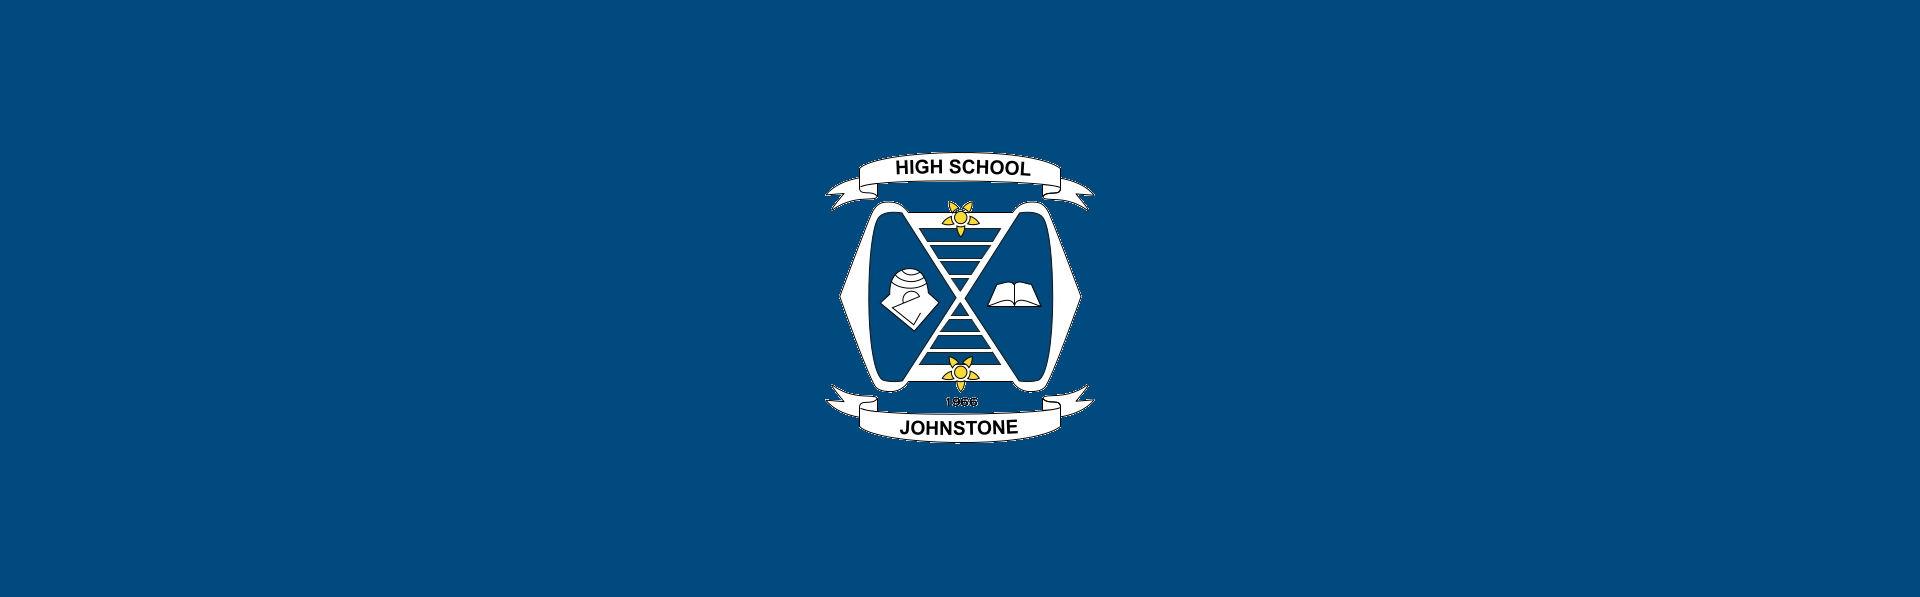 School Improvement Plan 201819 Johnstone High School